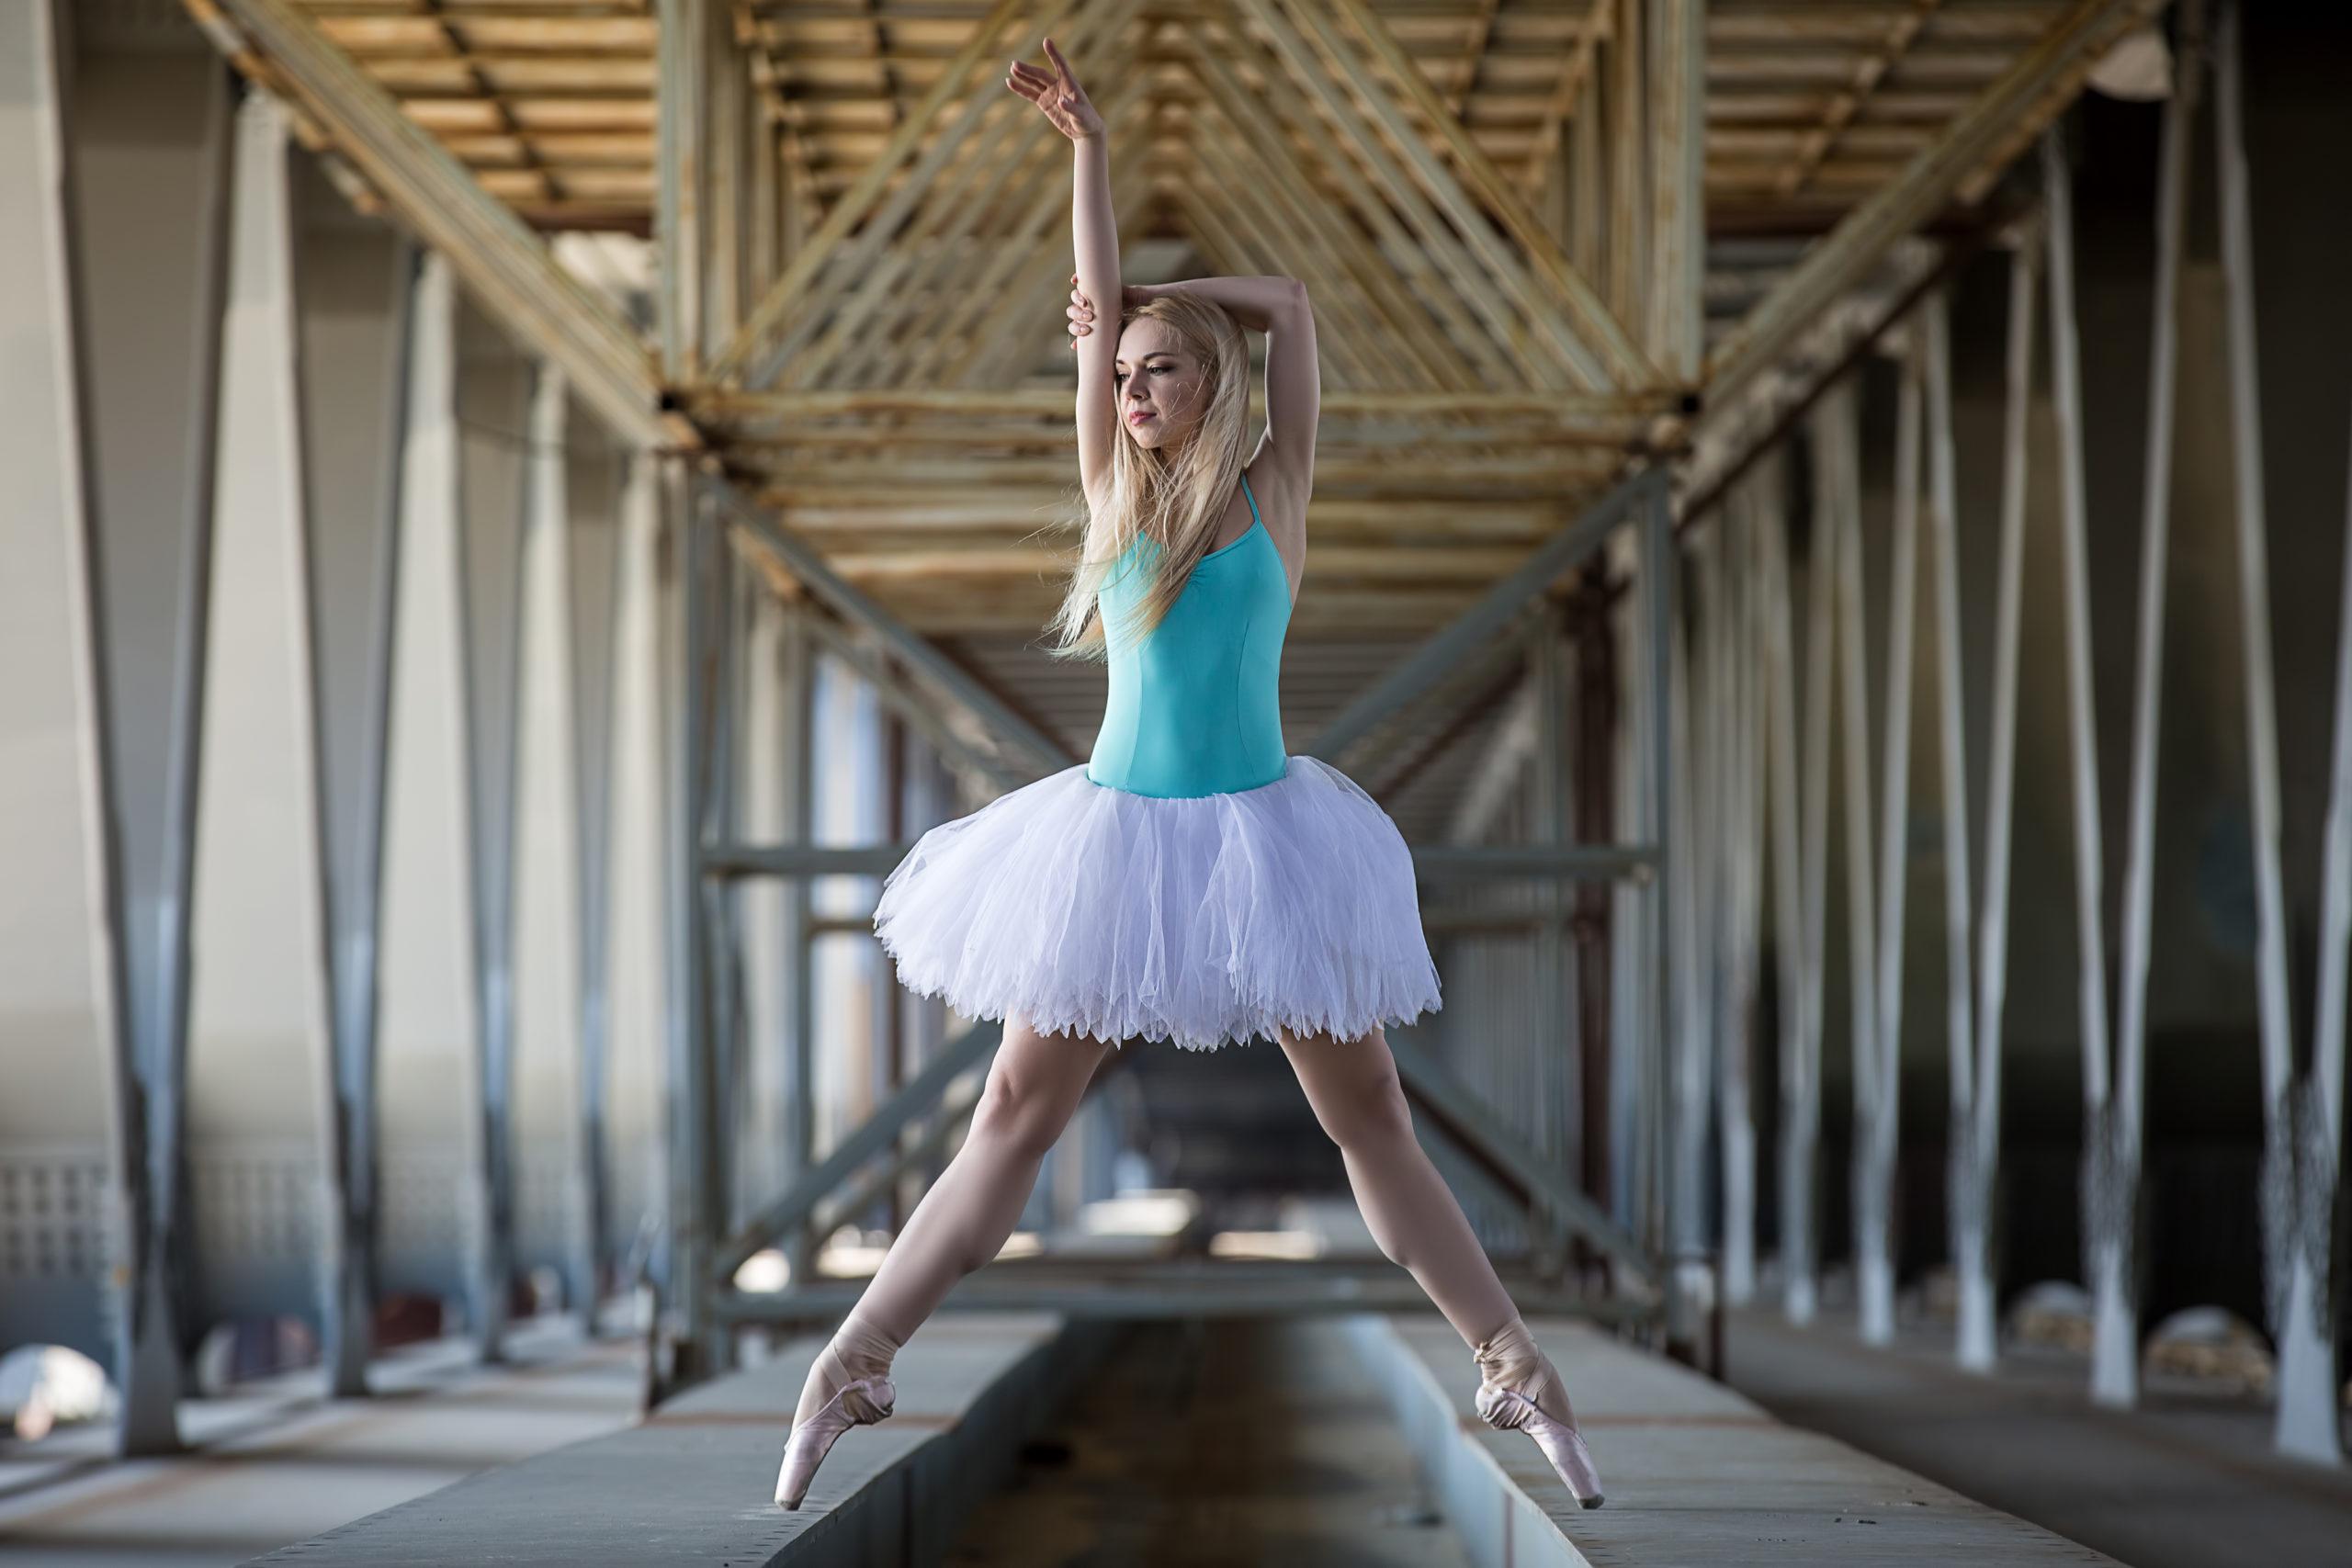 Graceful ballerina in white tutu in the industrial background of the bridge.